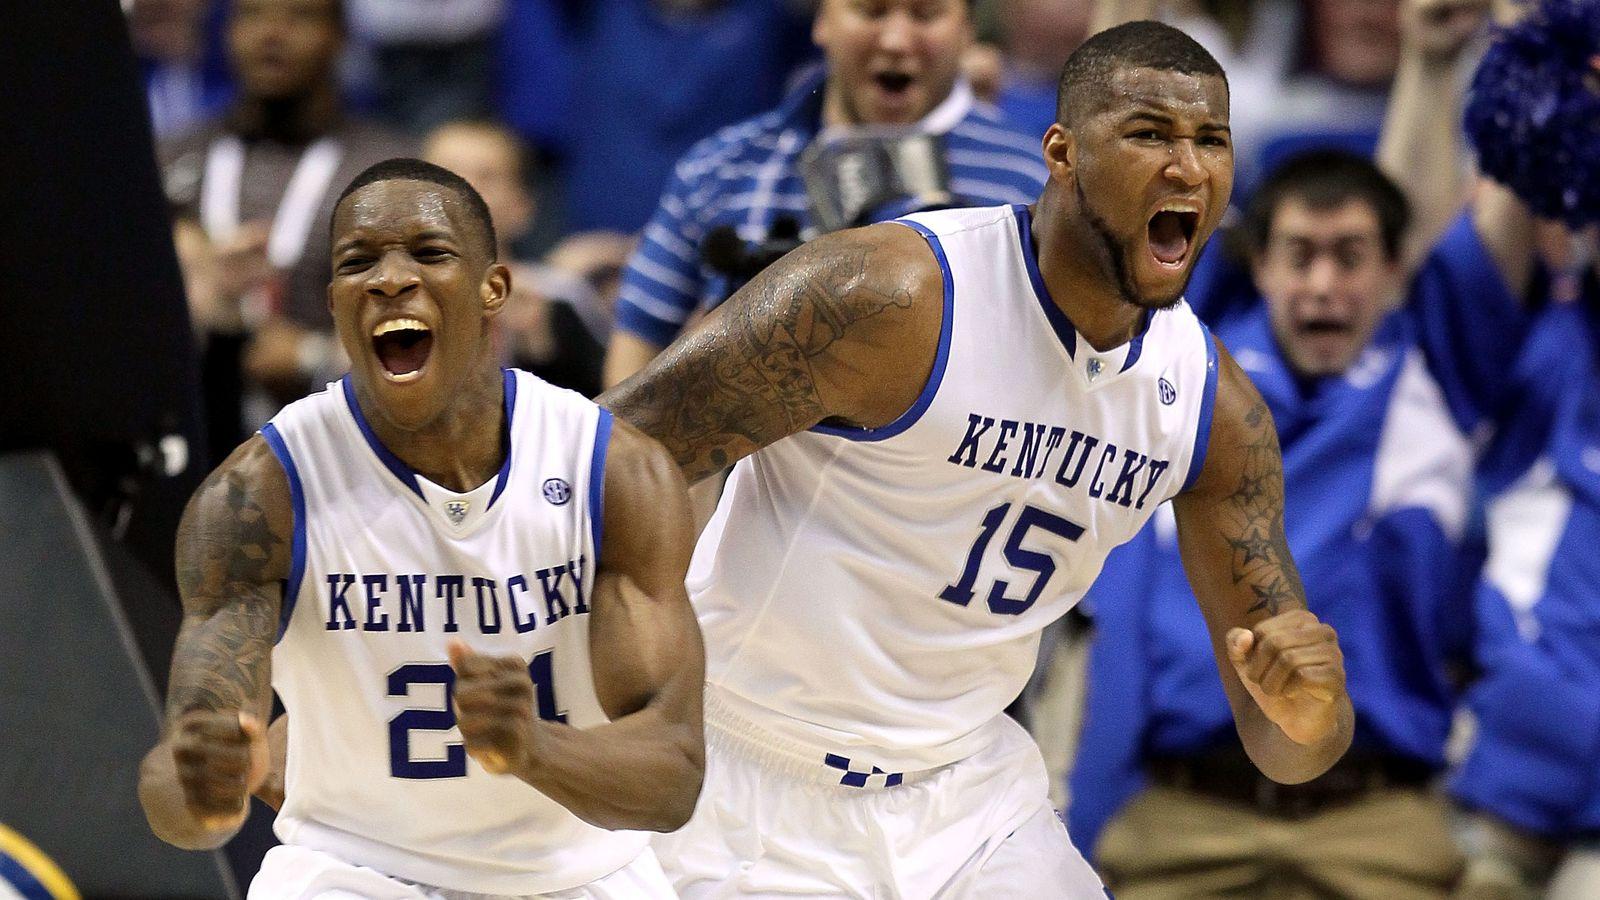 Uk Basketball: Kentucky Wildcats Vs North Carolina Alumni Charity Game On